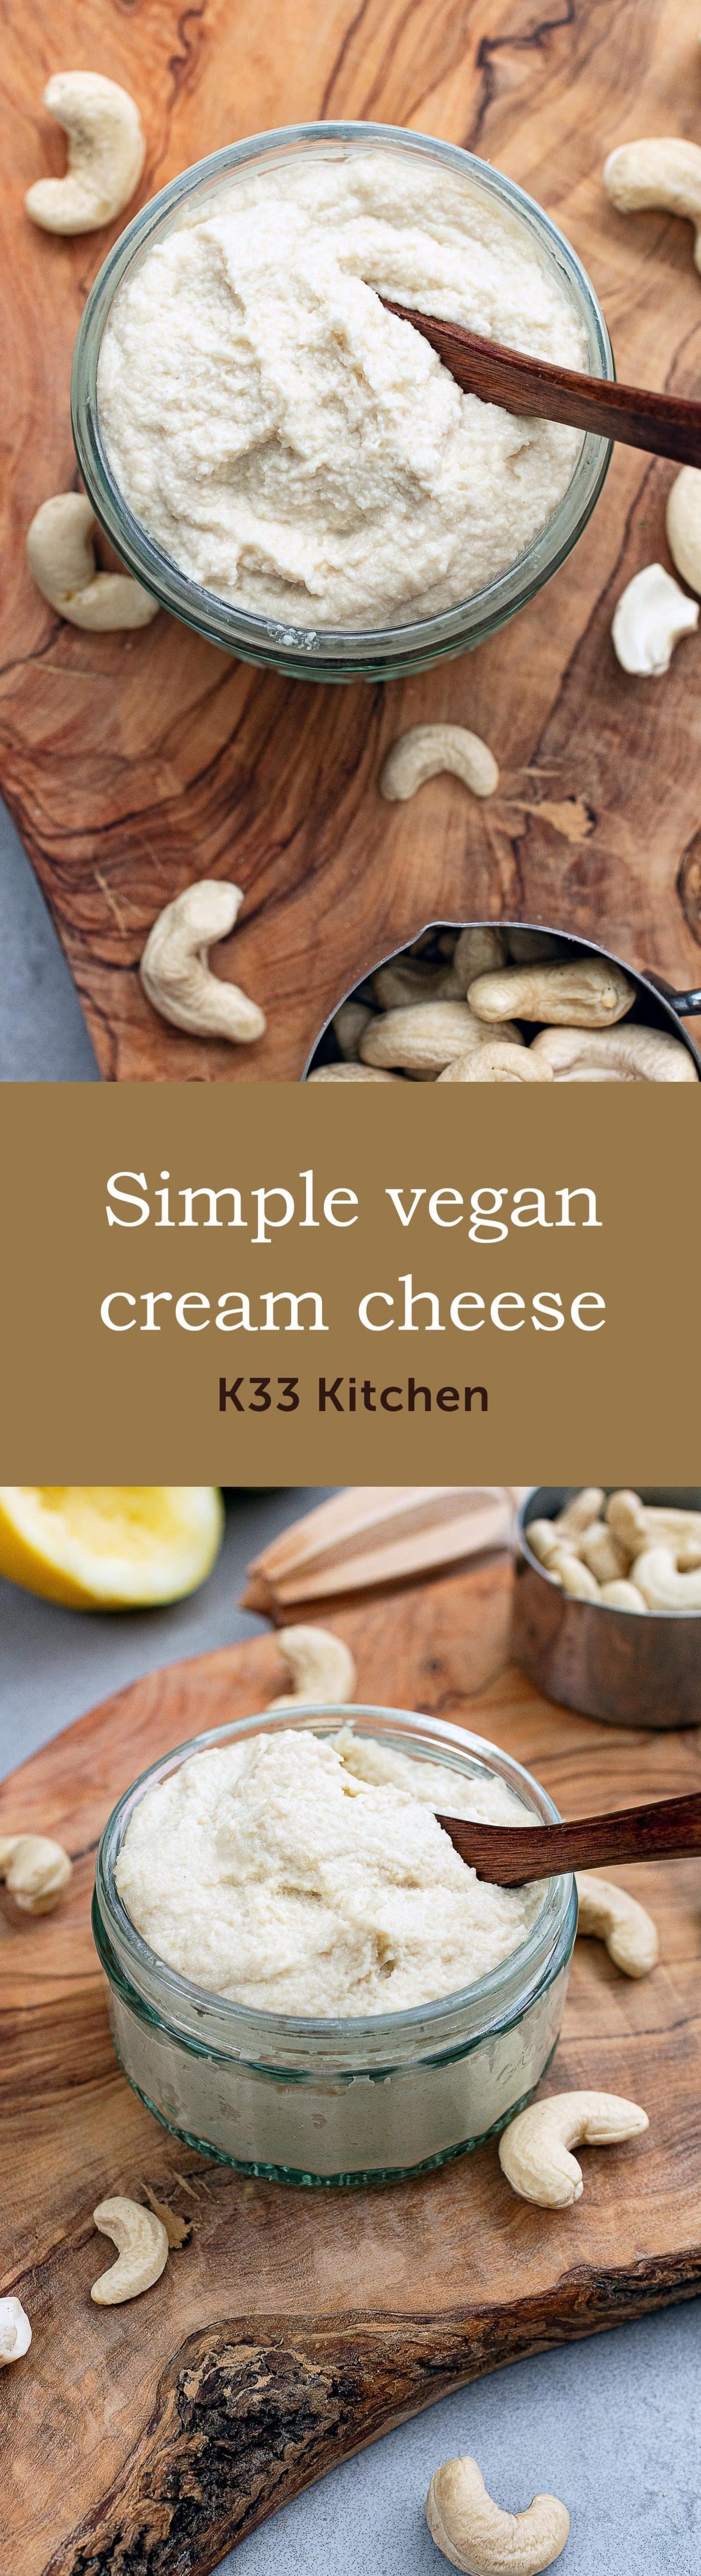 K33 Kitchen simple vegan cream cheese